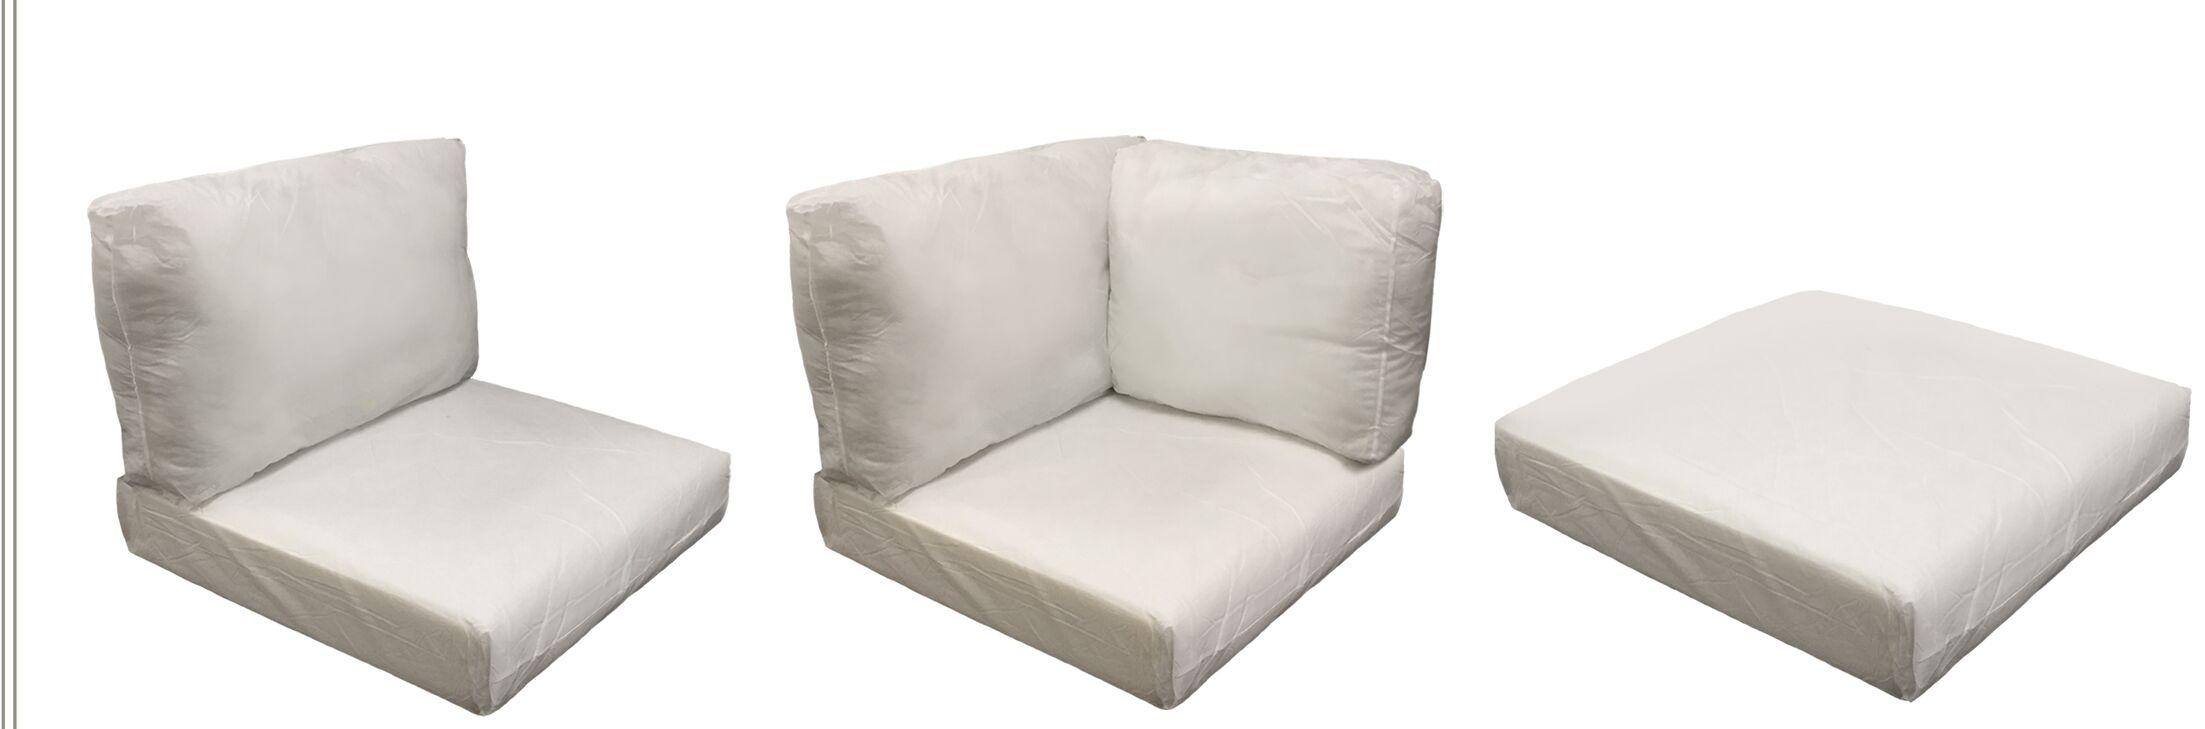 Fairmont Outdoor 23 Piece Lounge Chair Cushion Set